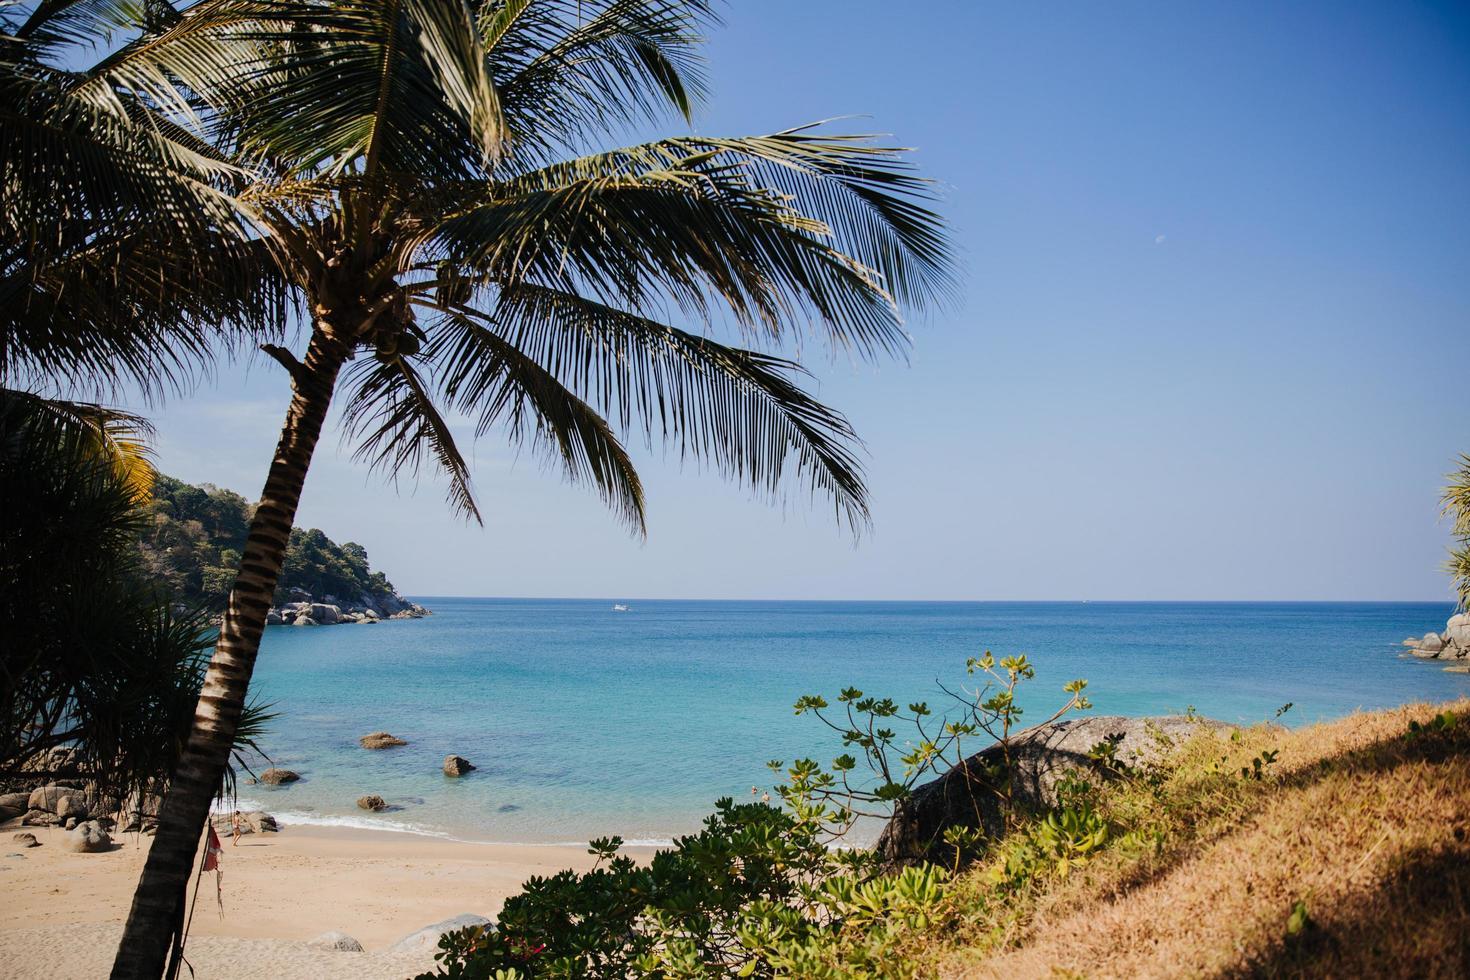 palmträd nära stranden foto